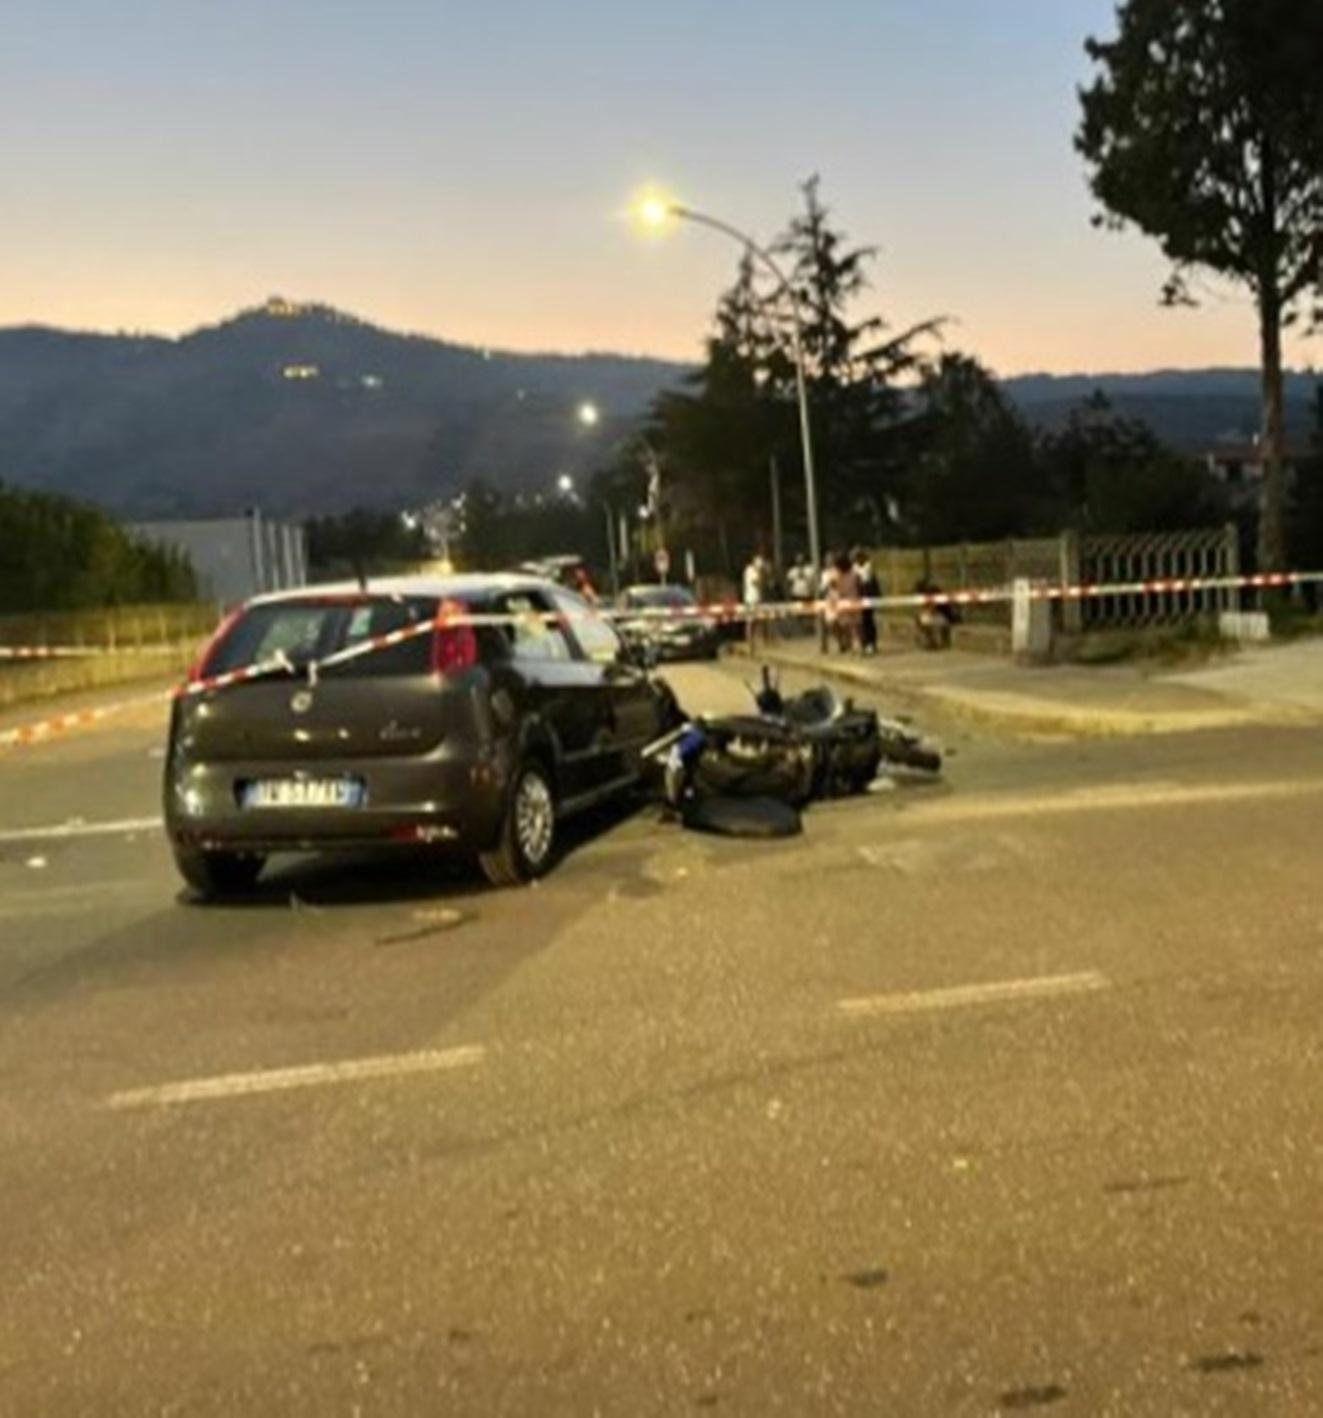 francesco cannistrà 32 anni morto incidente